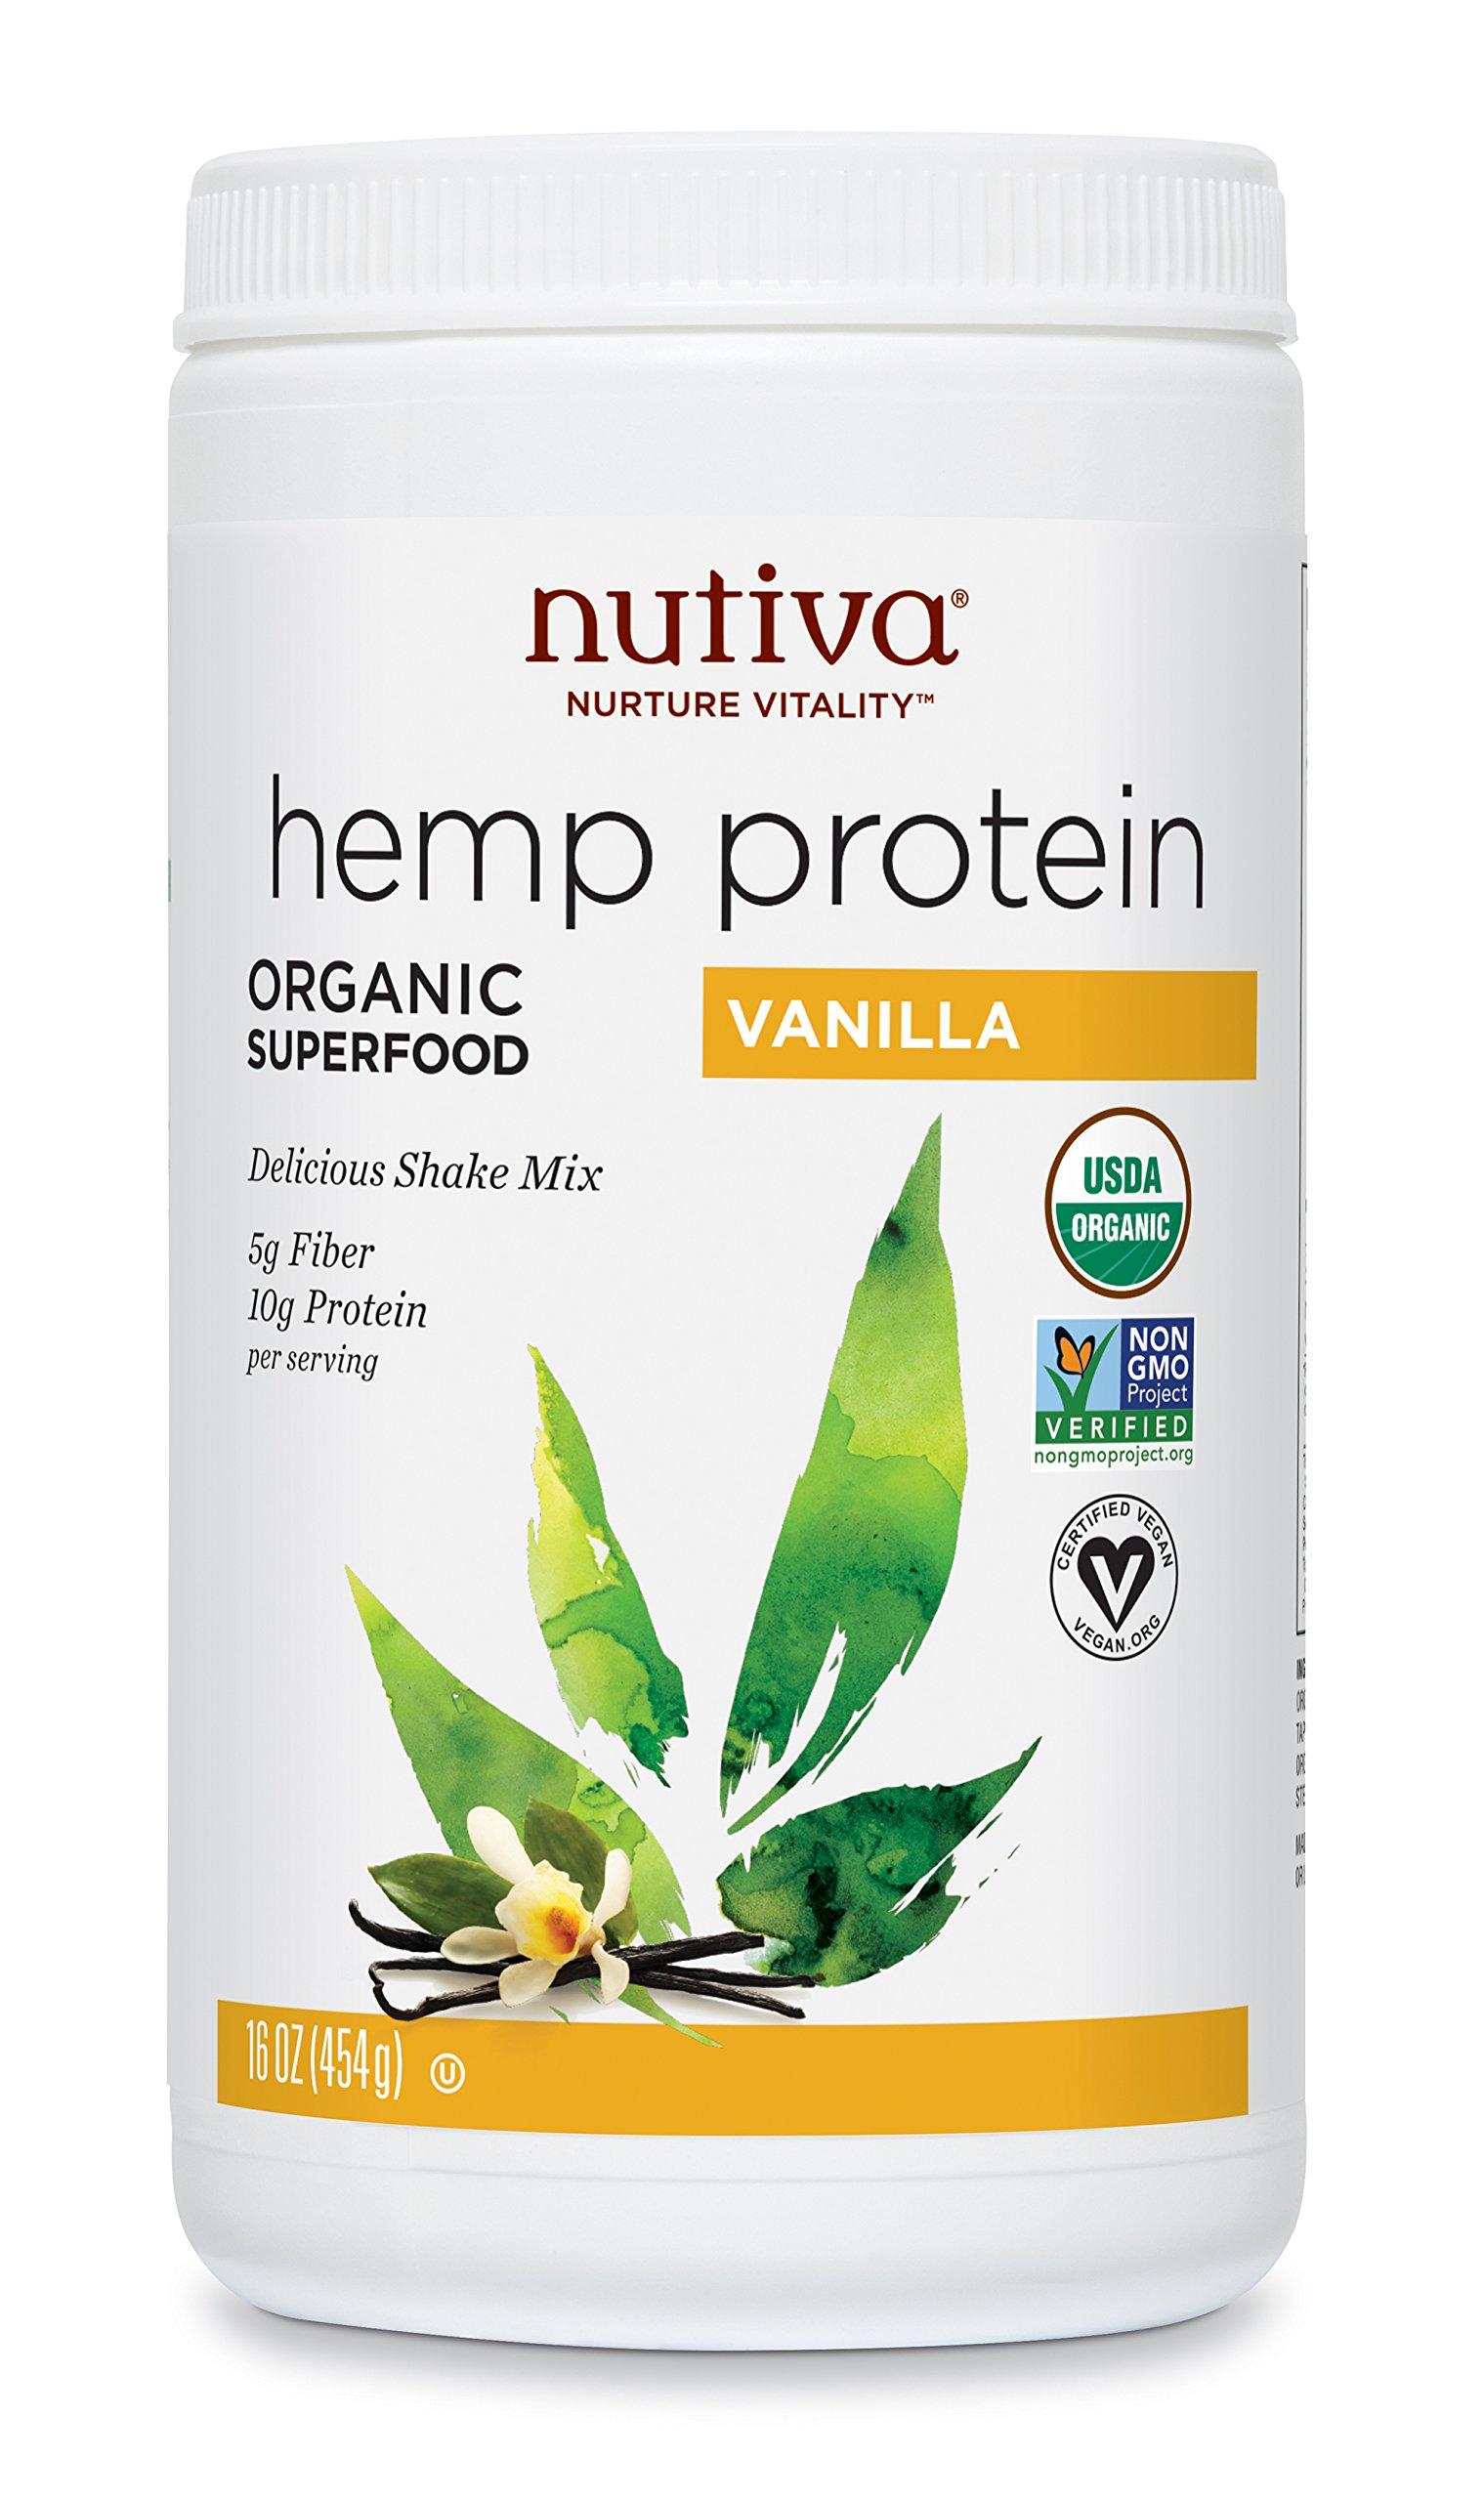 Nutiva Organic, Cold-Processed Hemp Seed Protein from non-GMO, Sustainably Farmed Canadian Hempseed, Vanilla, 16-ounce